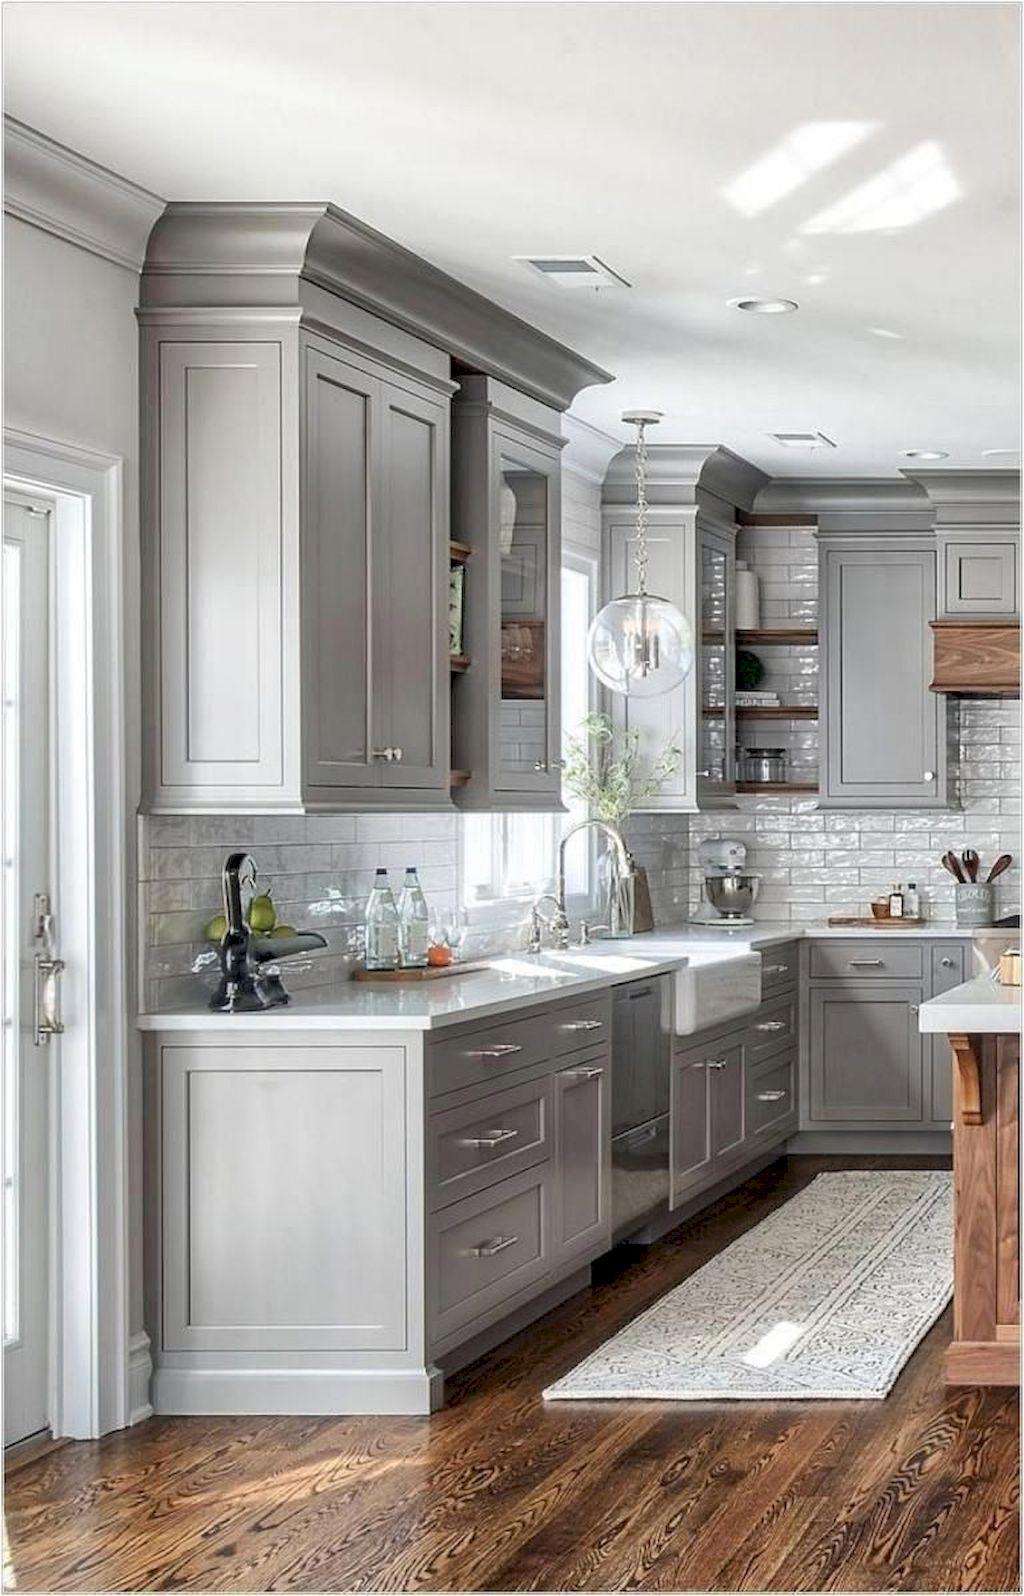 65 Farmhouse Kitchen Backsplash Design Ideas   Kitchen Design